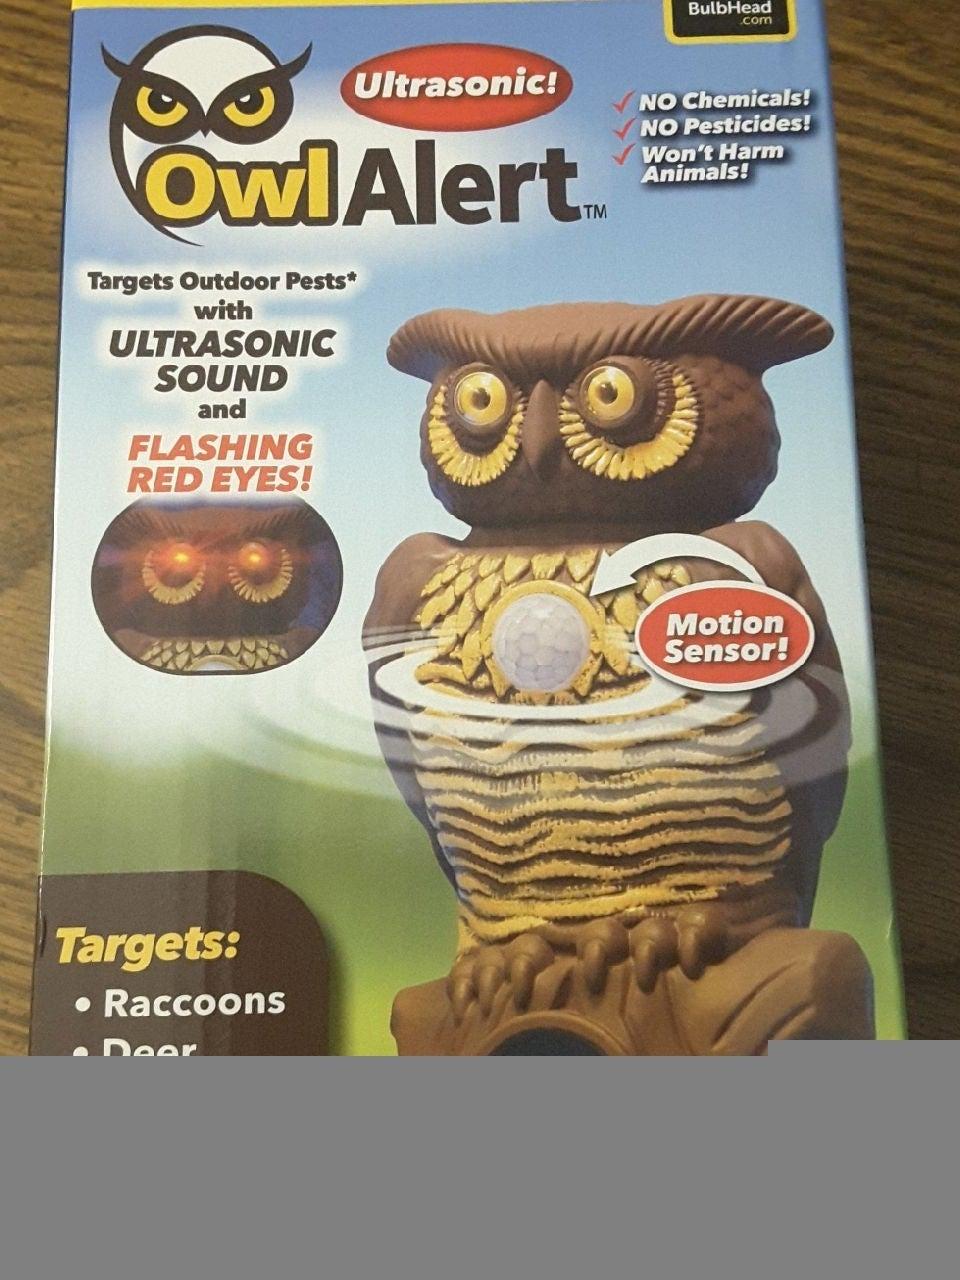 Ultrasonic Owl Alert by Bulbhead